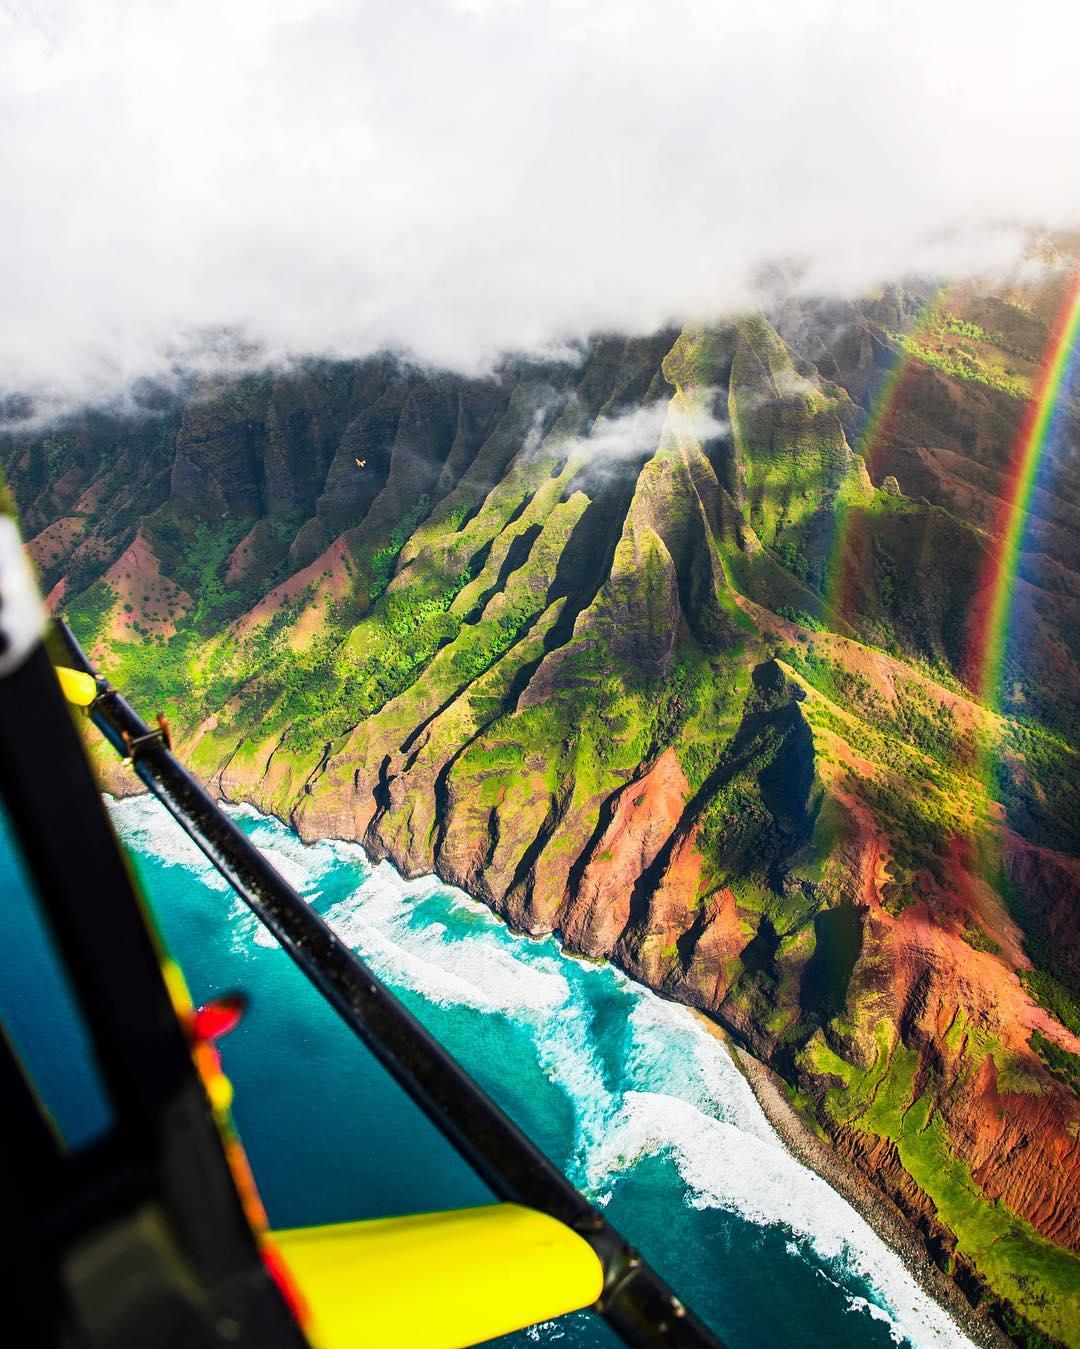 Природа и путешествия на фотографиях Мо Хабиба